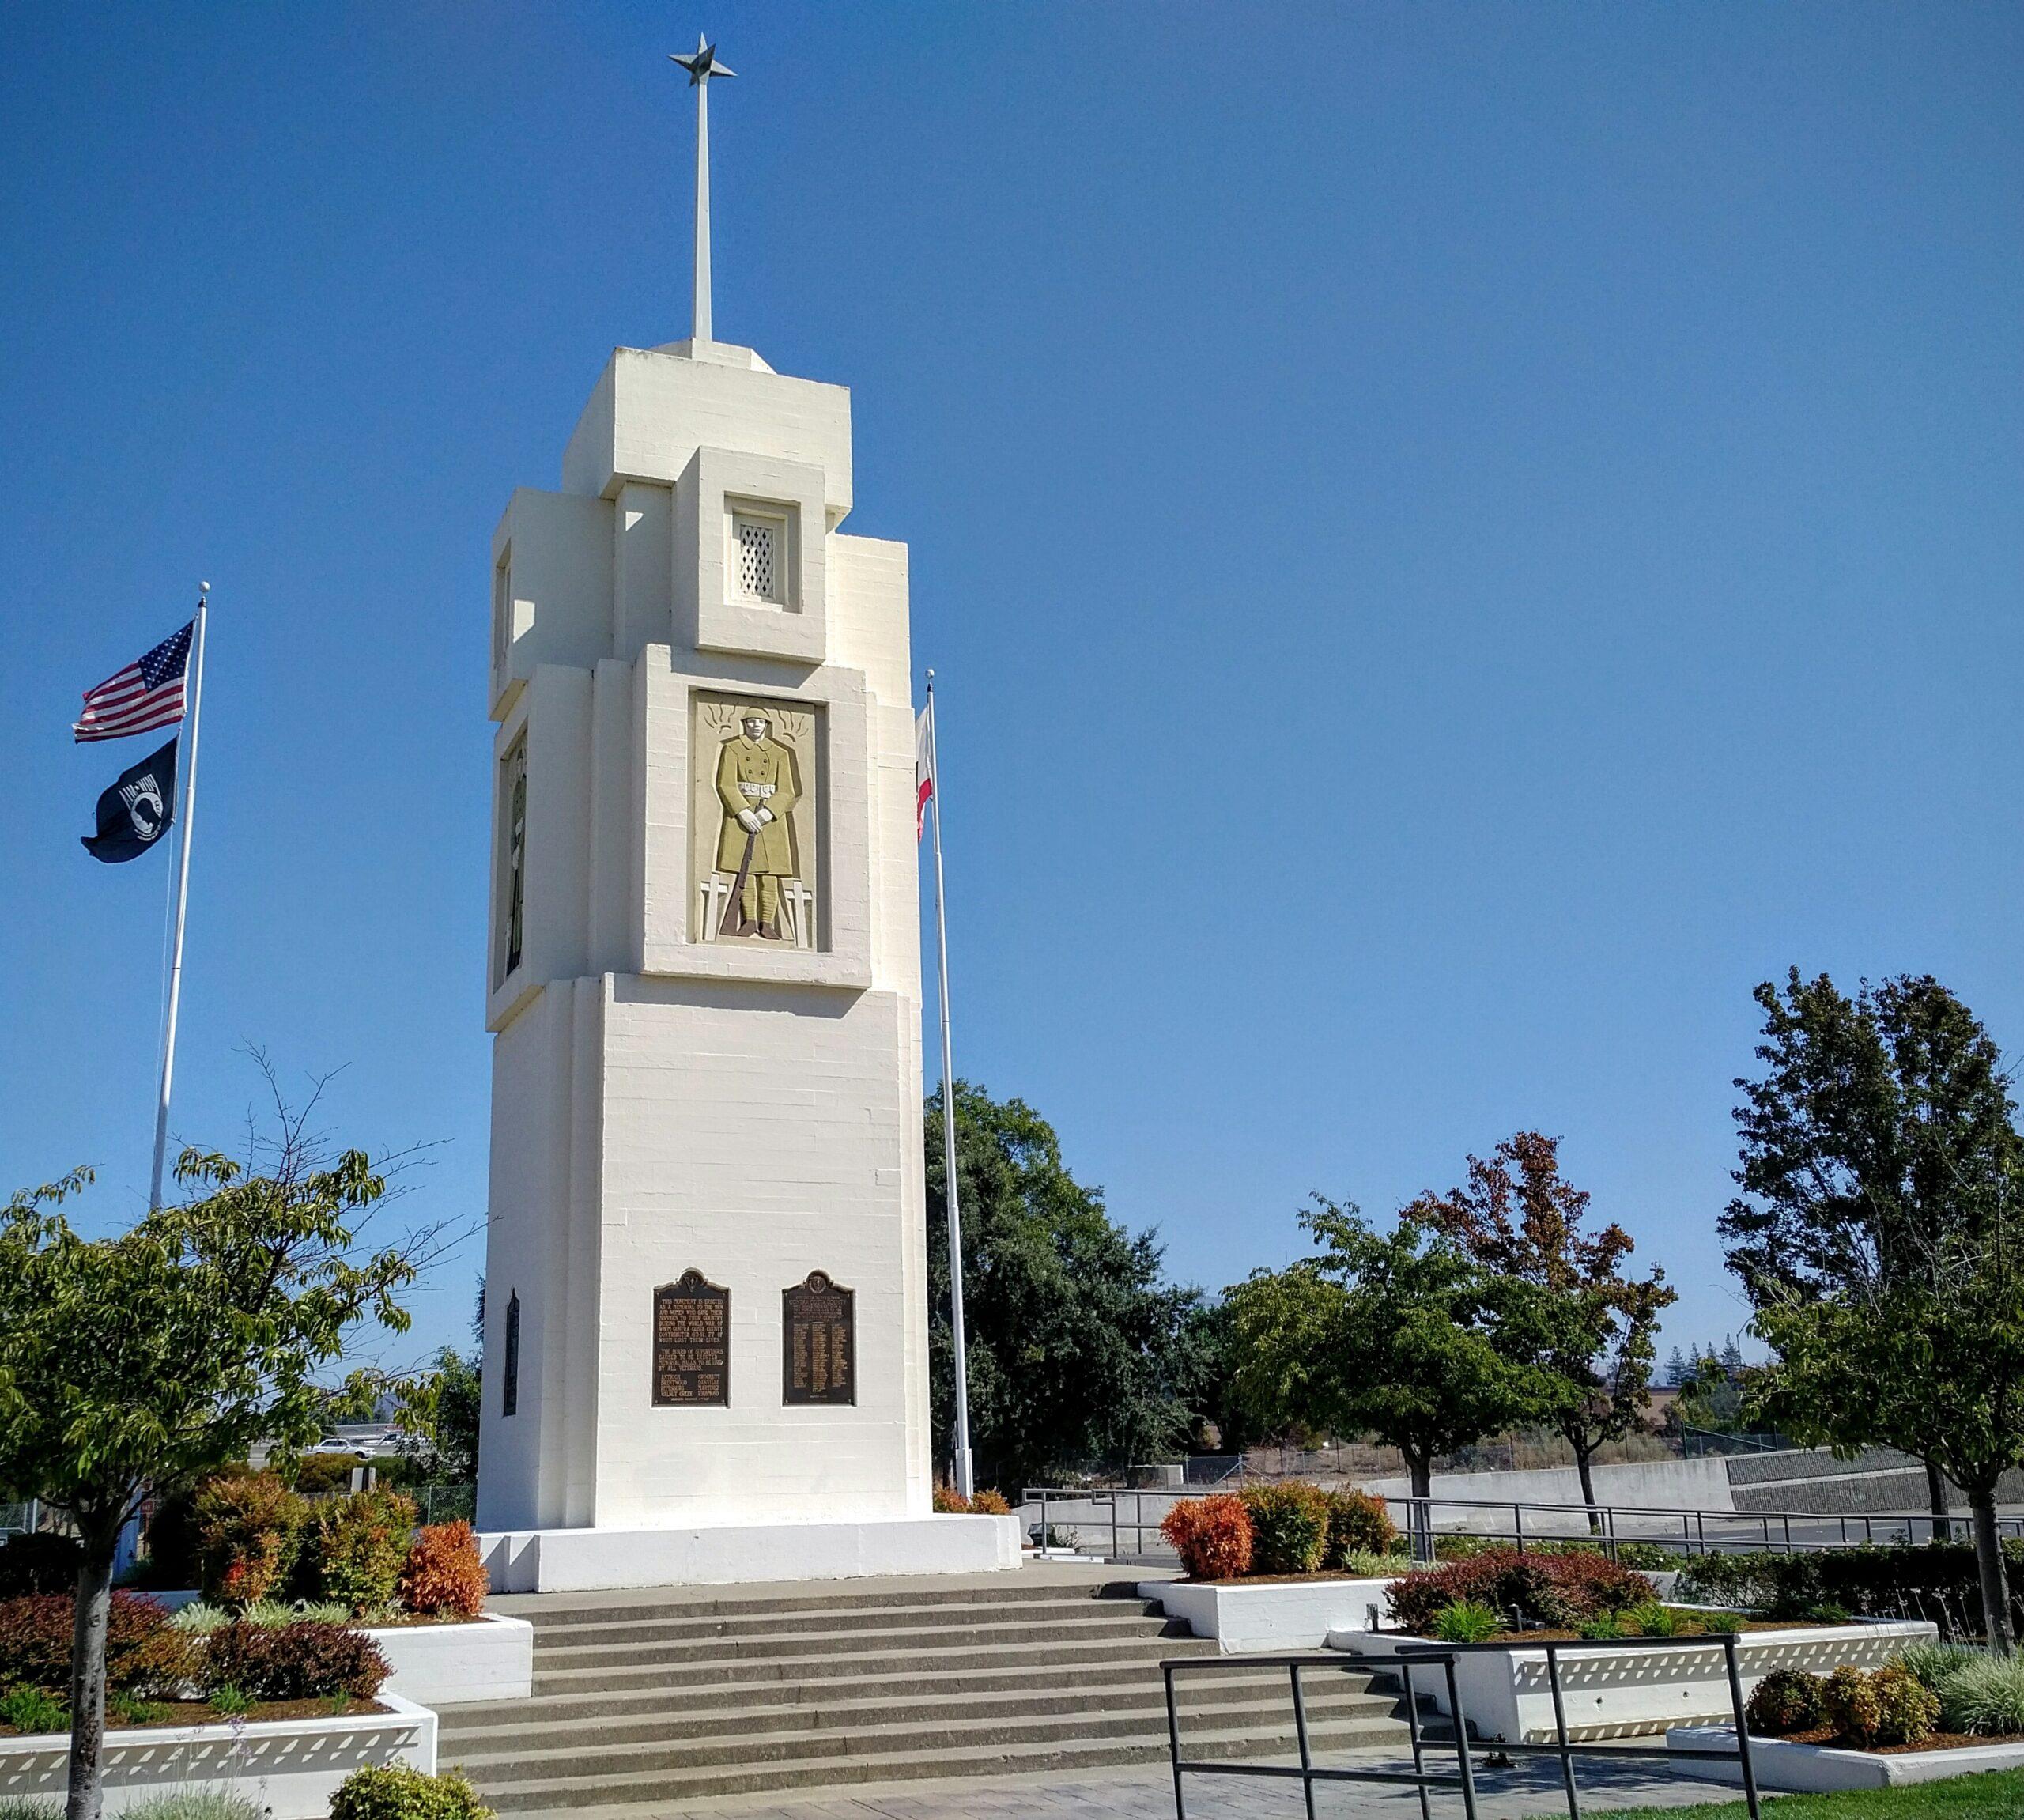 Soldiers_Memorial_Pleasant_Hill_California_at_Boyd_Road_v3